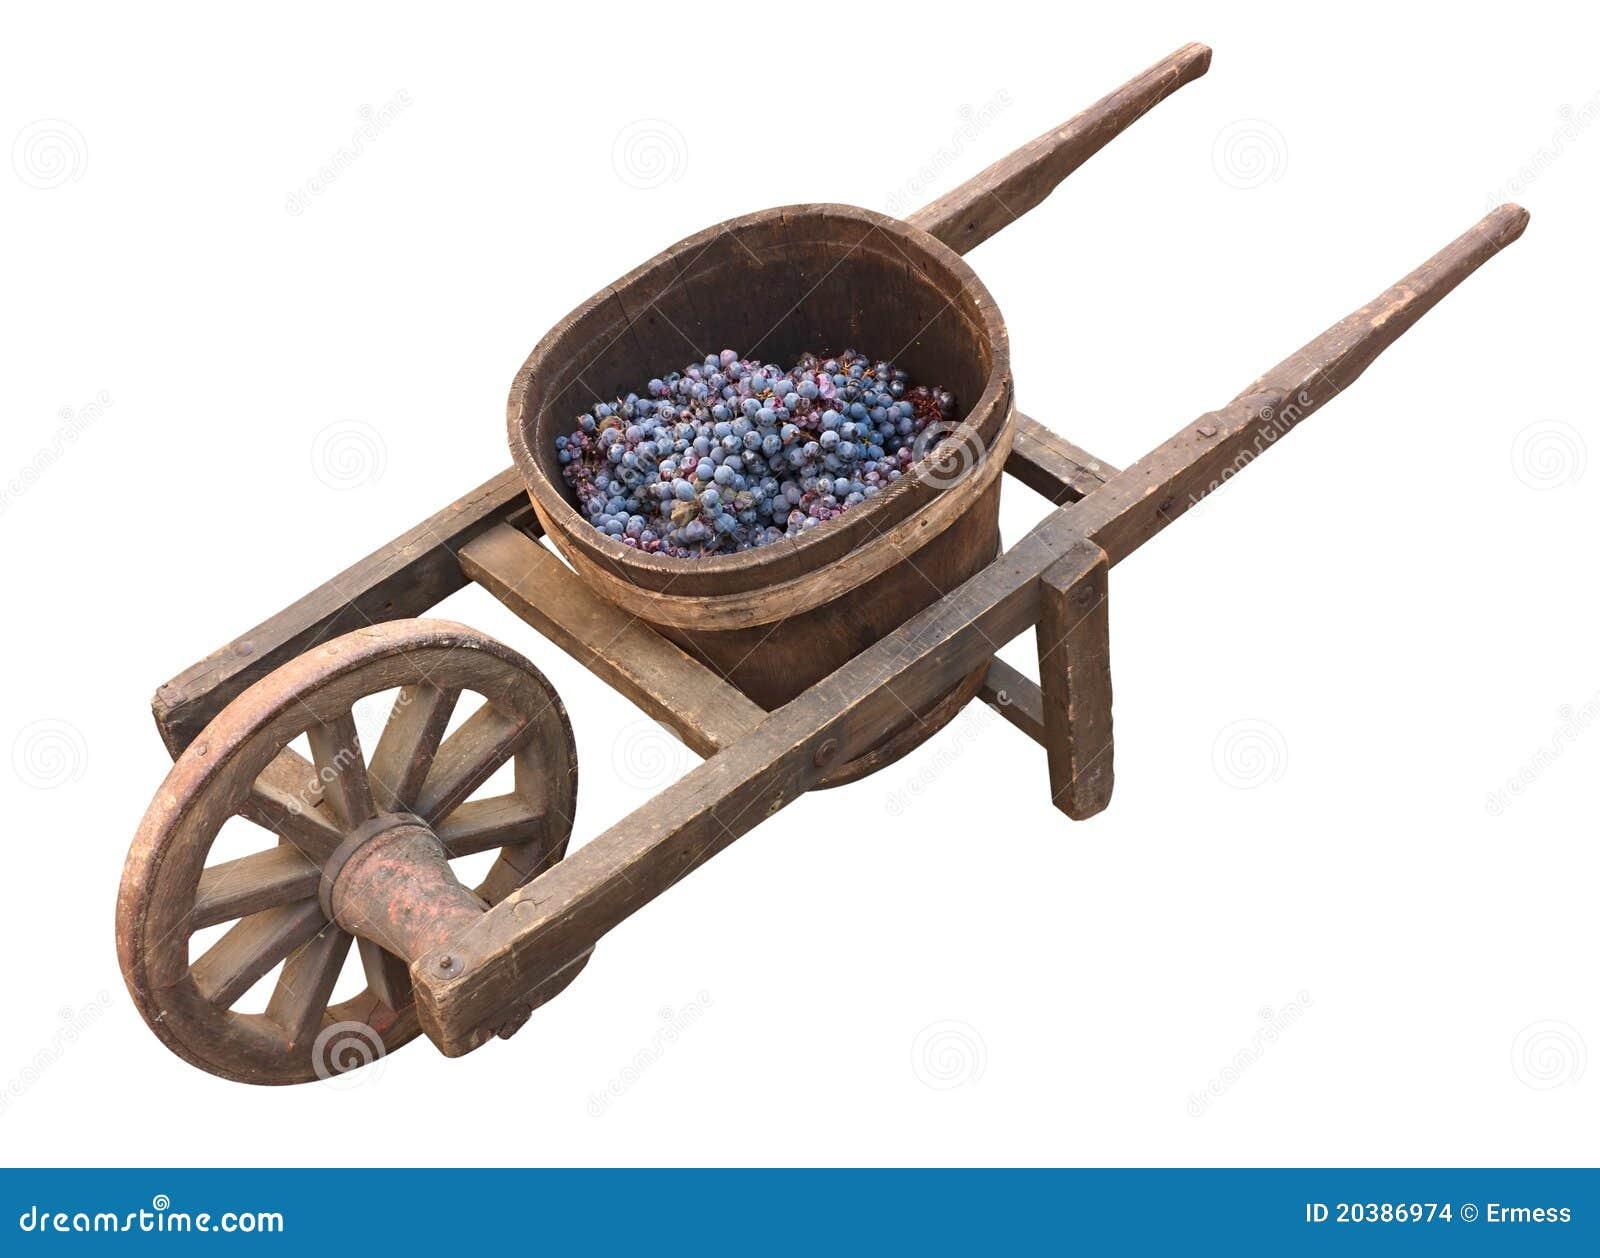 old wheelbarrow for grape transport stock images image 20386974. Black Bedroom Furniture Sets. Home Design Ideas